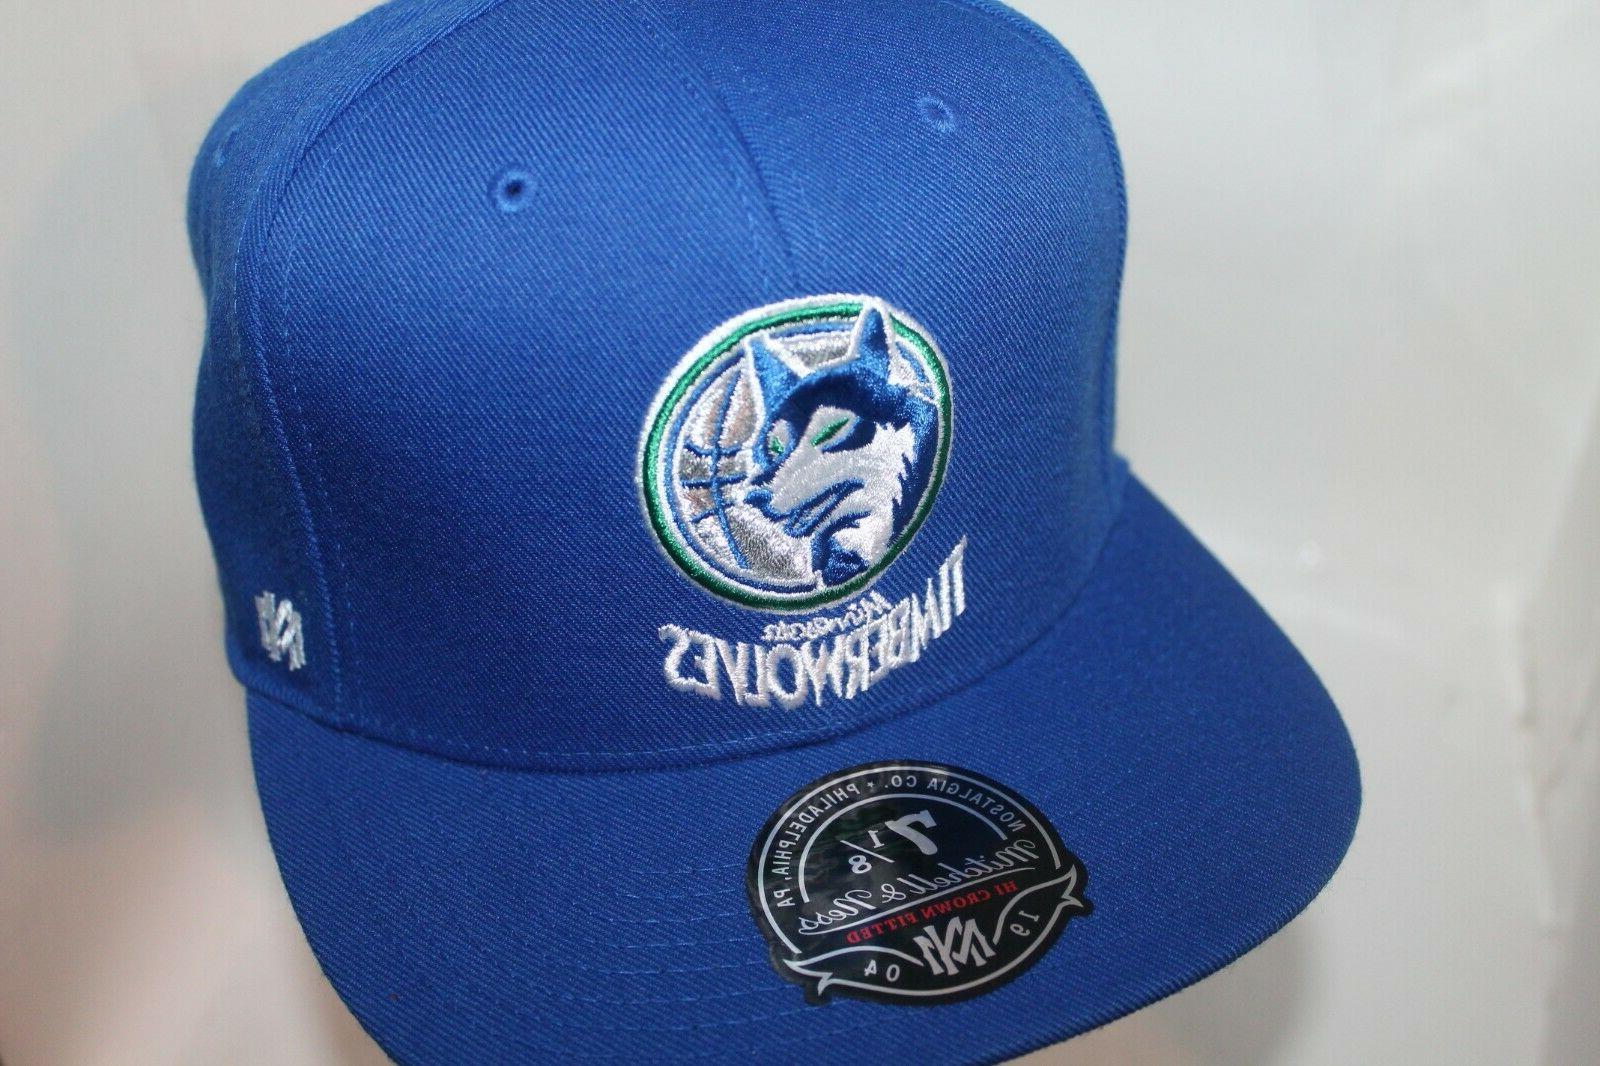 Minnesota Timberwolves & Ness NBA Team Hi Crown